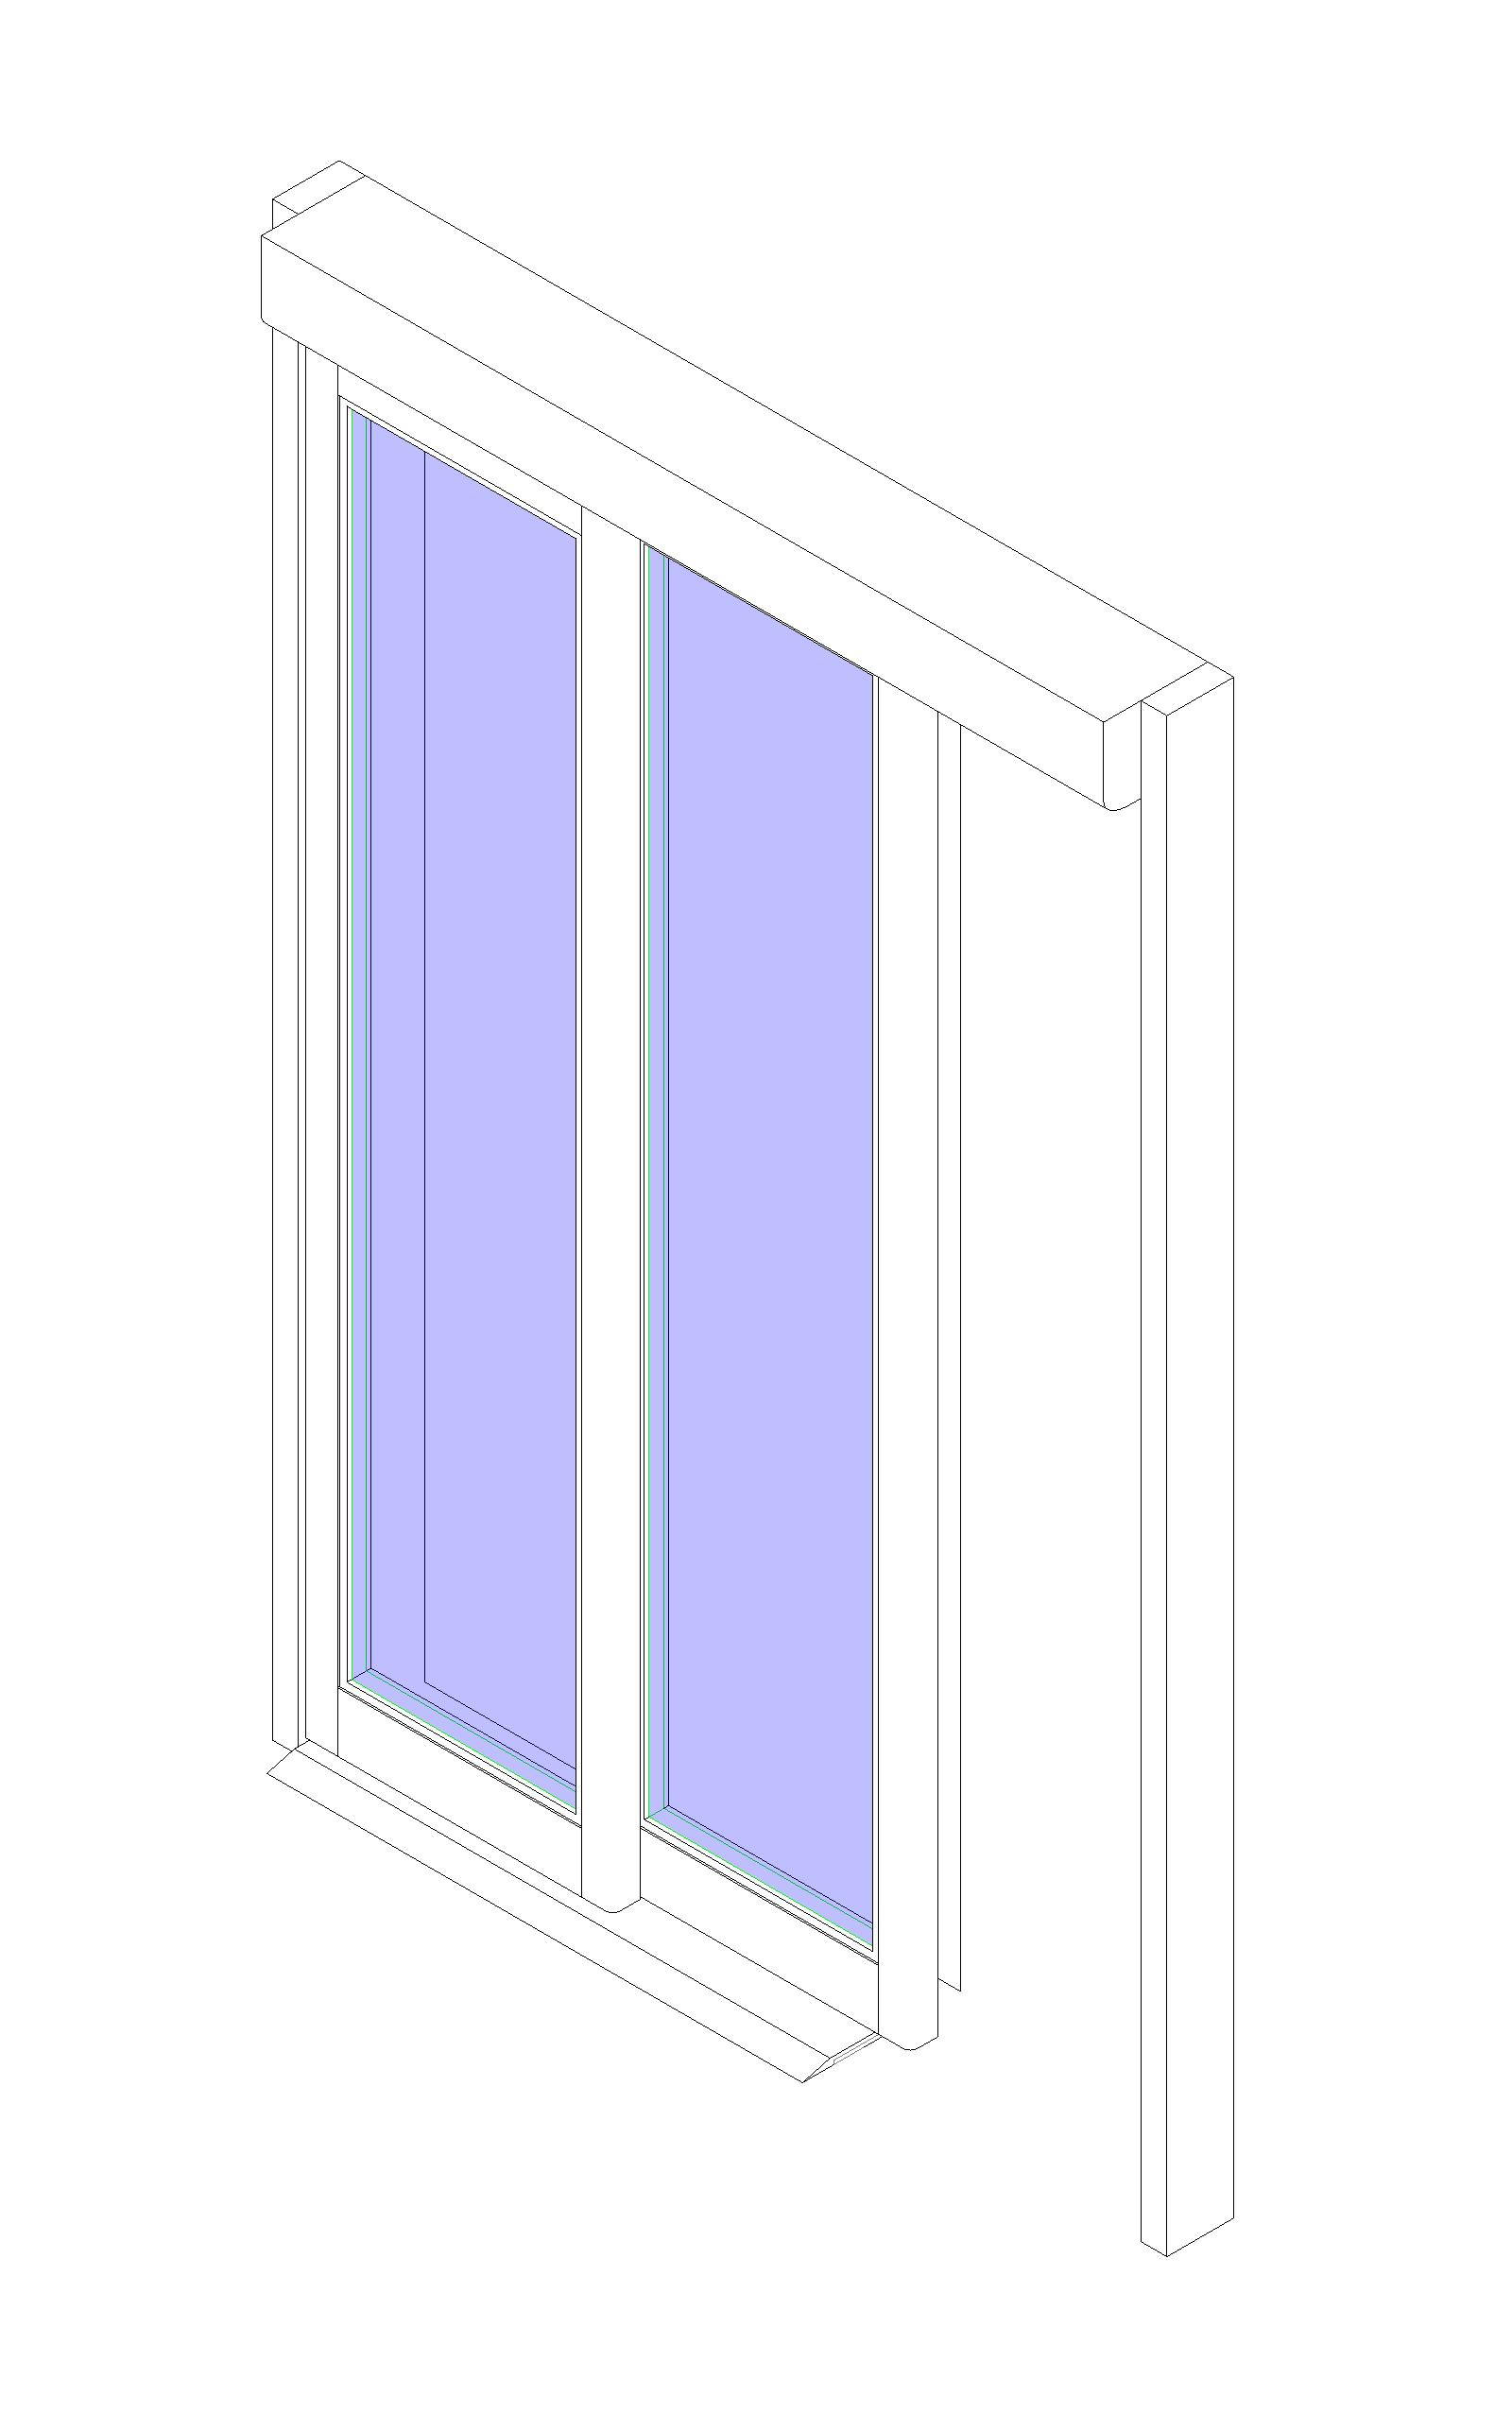 2554 #2828A3 Doors And Hardware: Doors: Sliding: UniSlide: SS Surface Telescopic  wallpaper Telescopic Sliding Doors 3651600